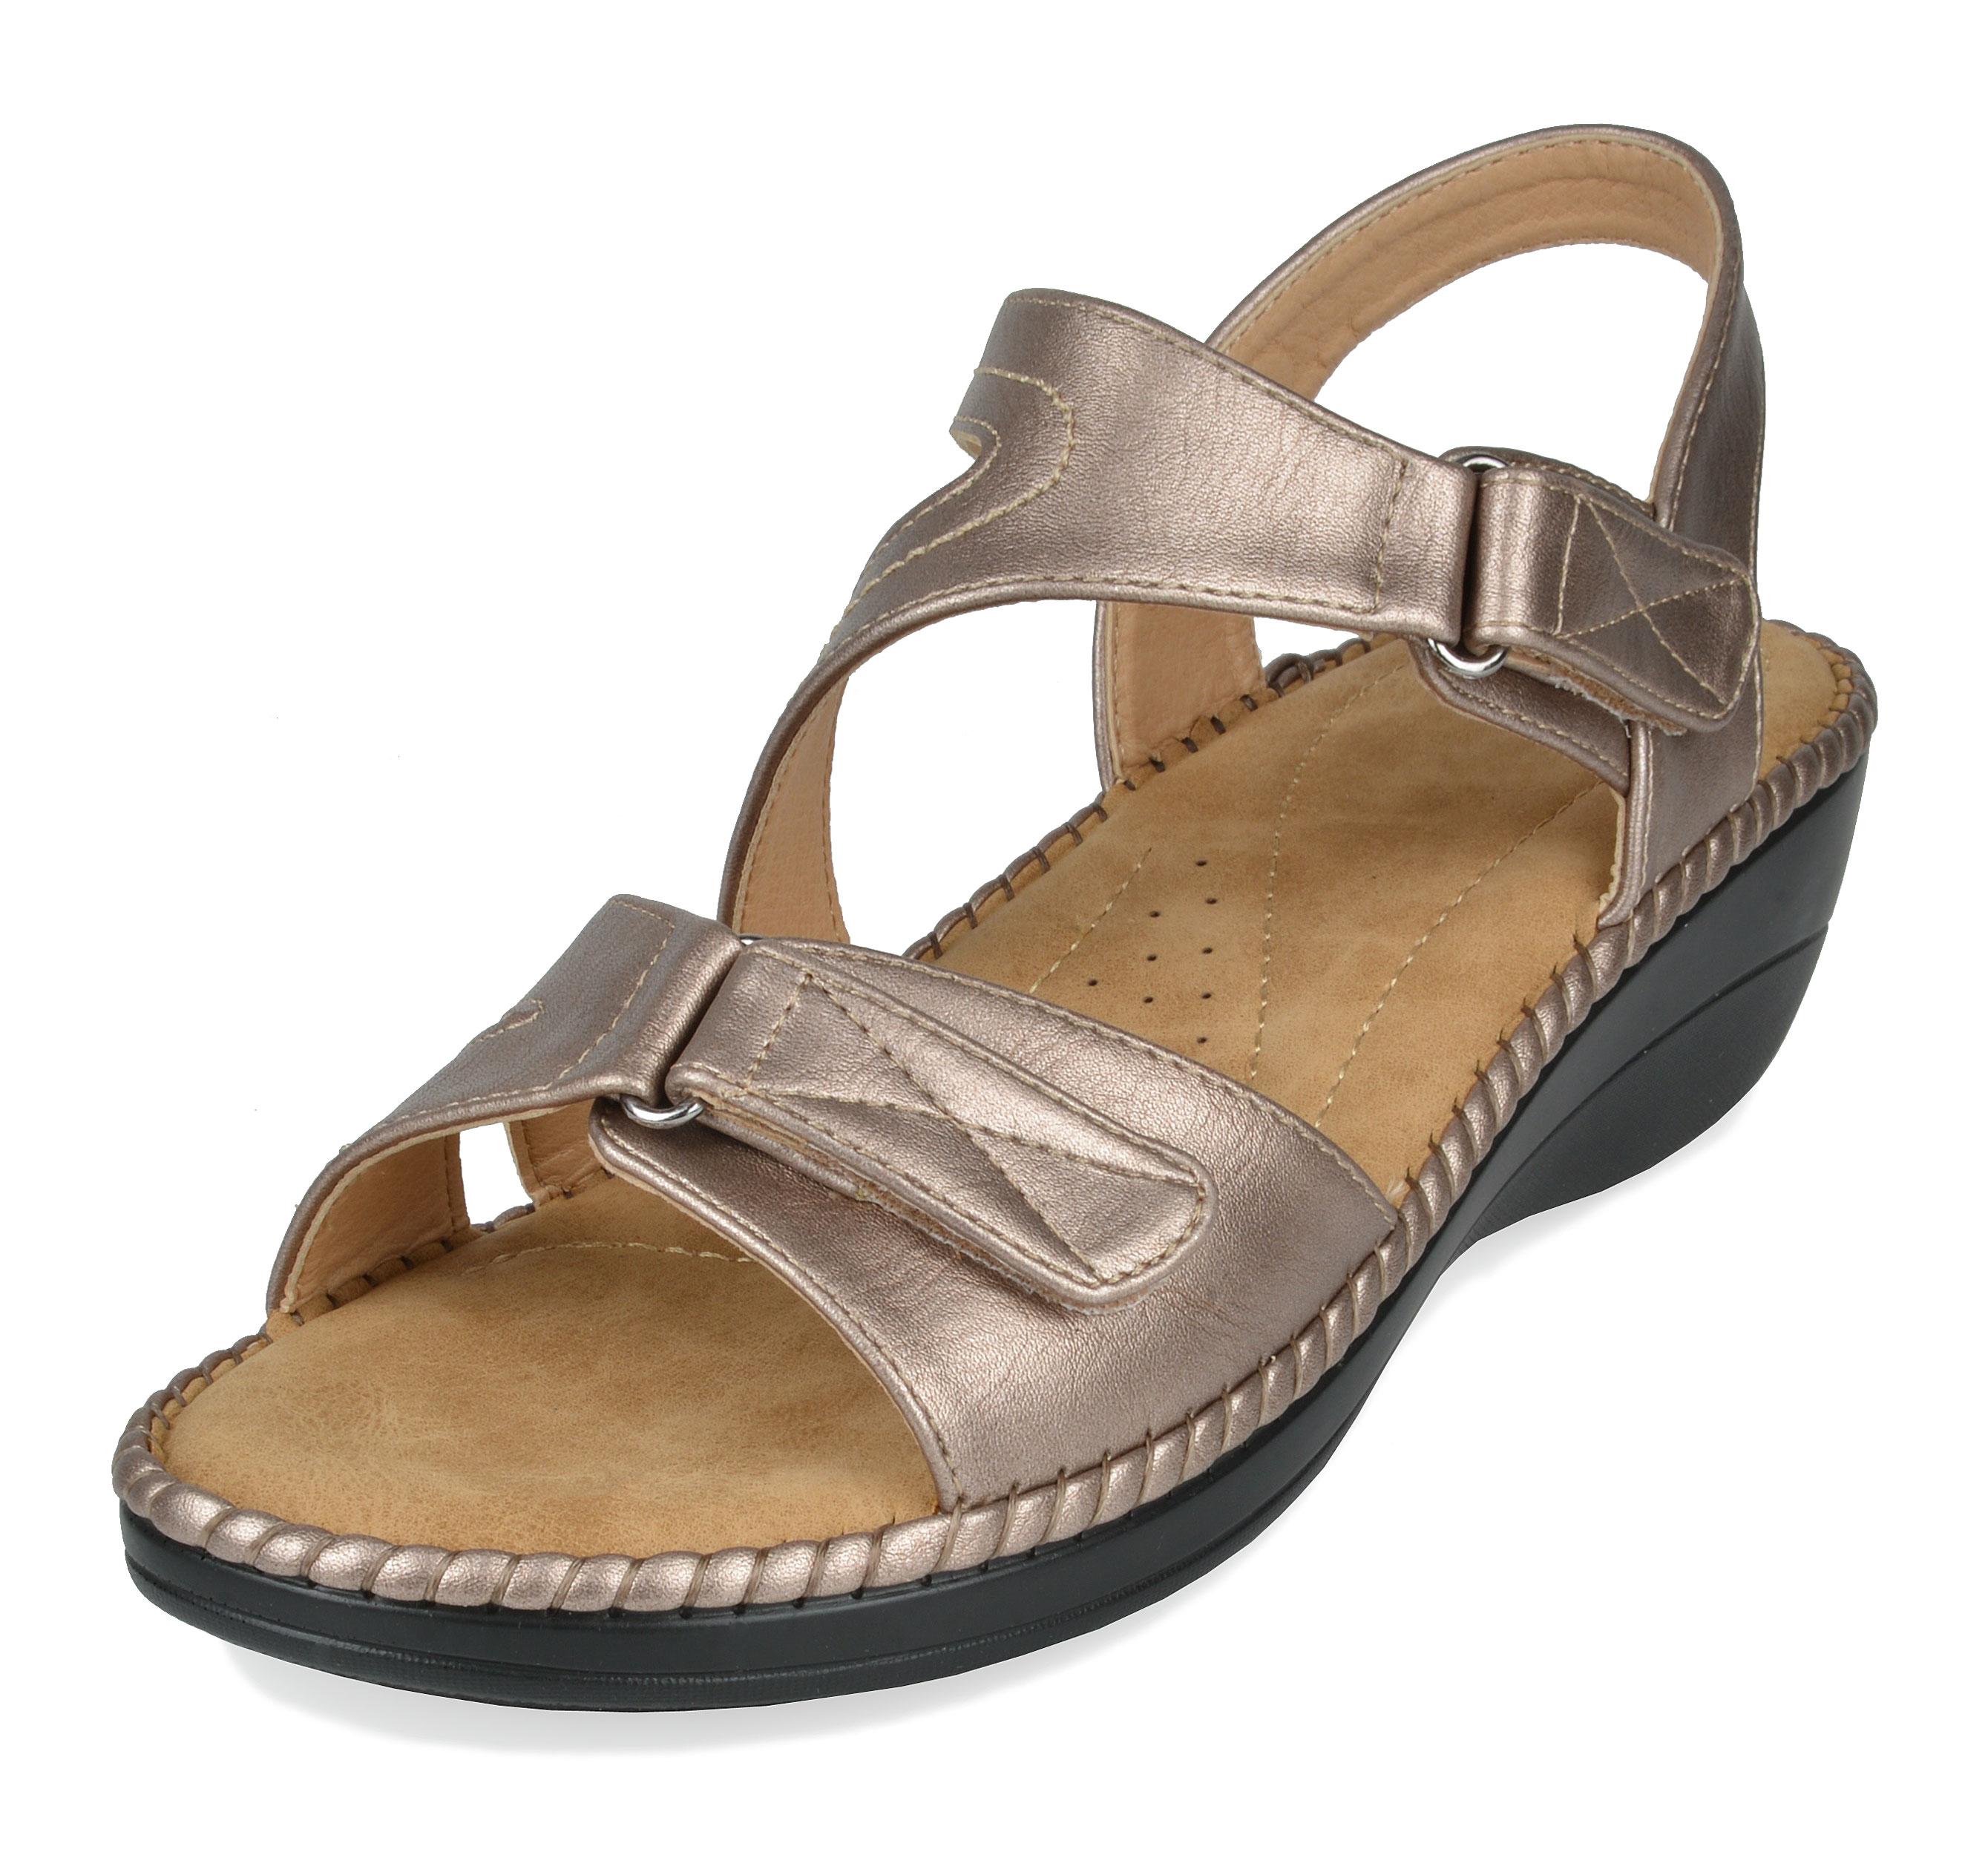 aa18b510ee DREAM PAIRS Women TRUESOFT Soft Back Strap Low Heel Platform Wedge ...